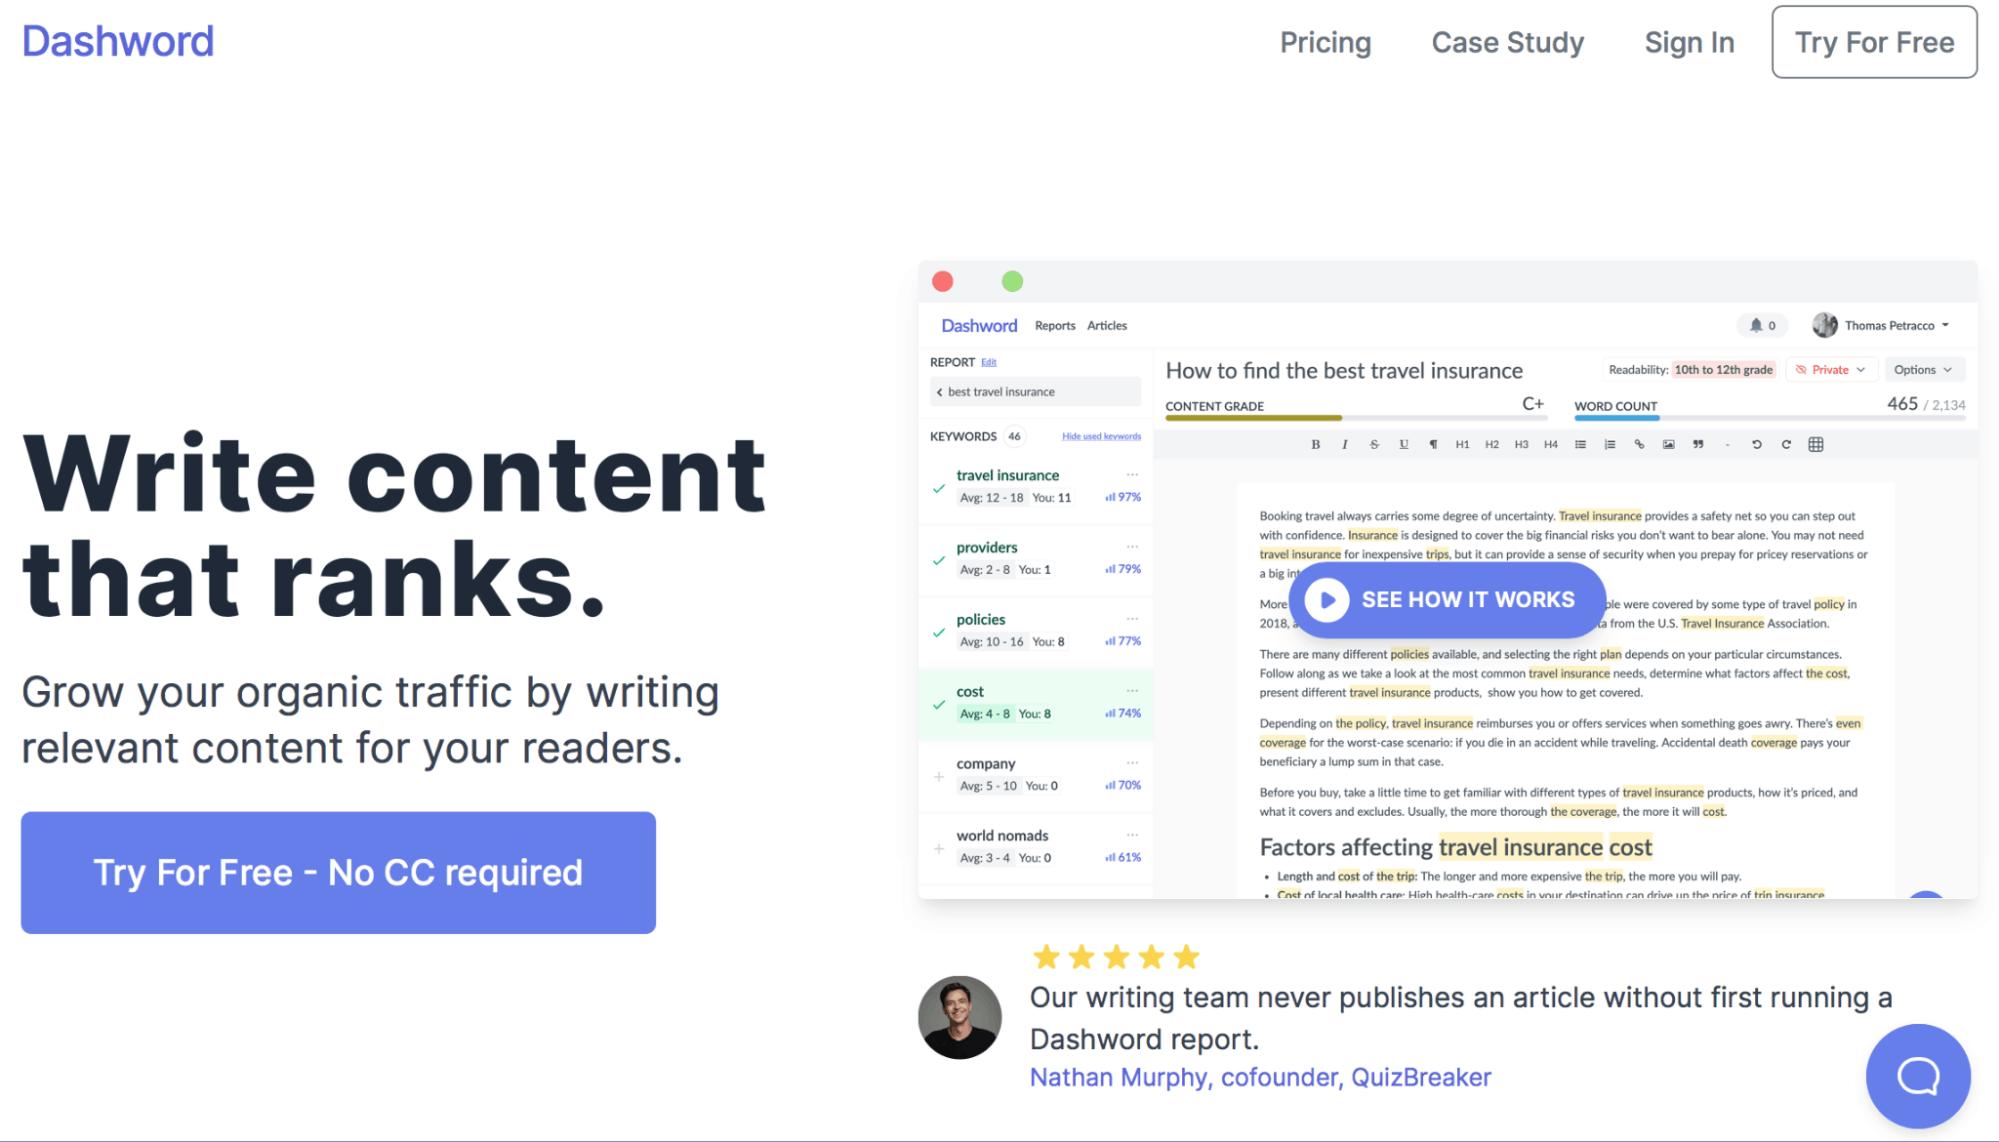 Dashword Landing Page - Content Optimization